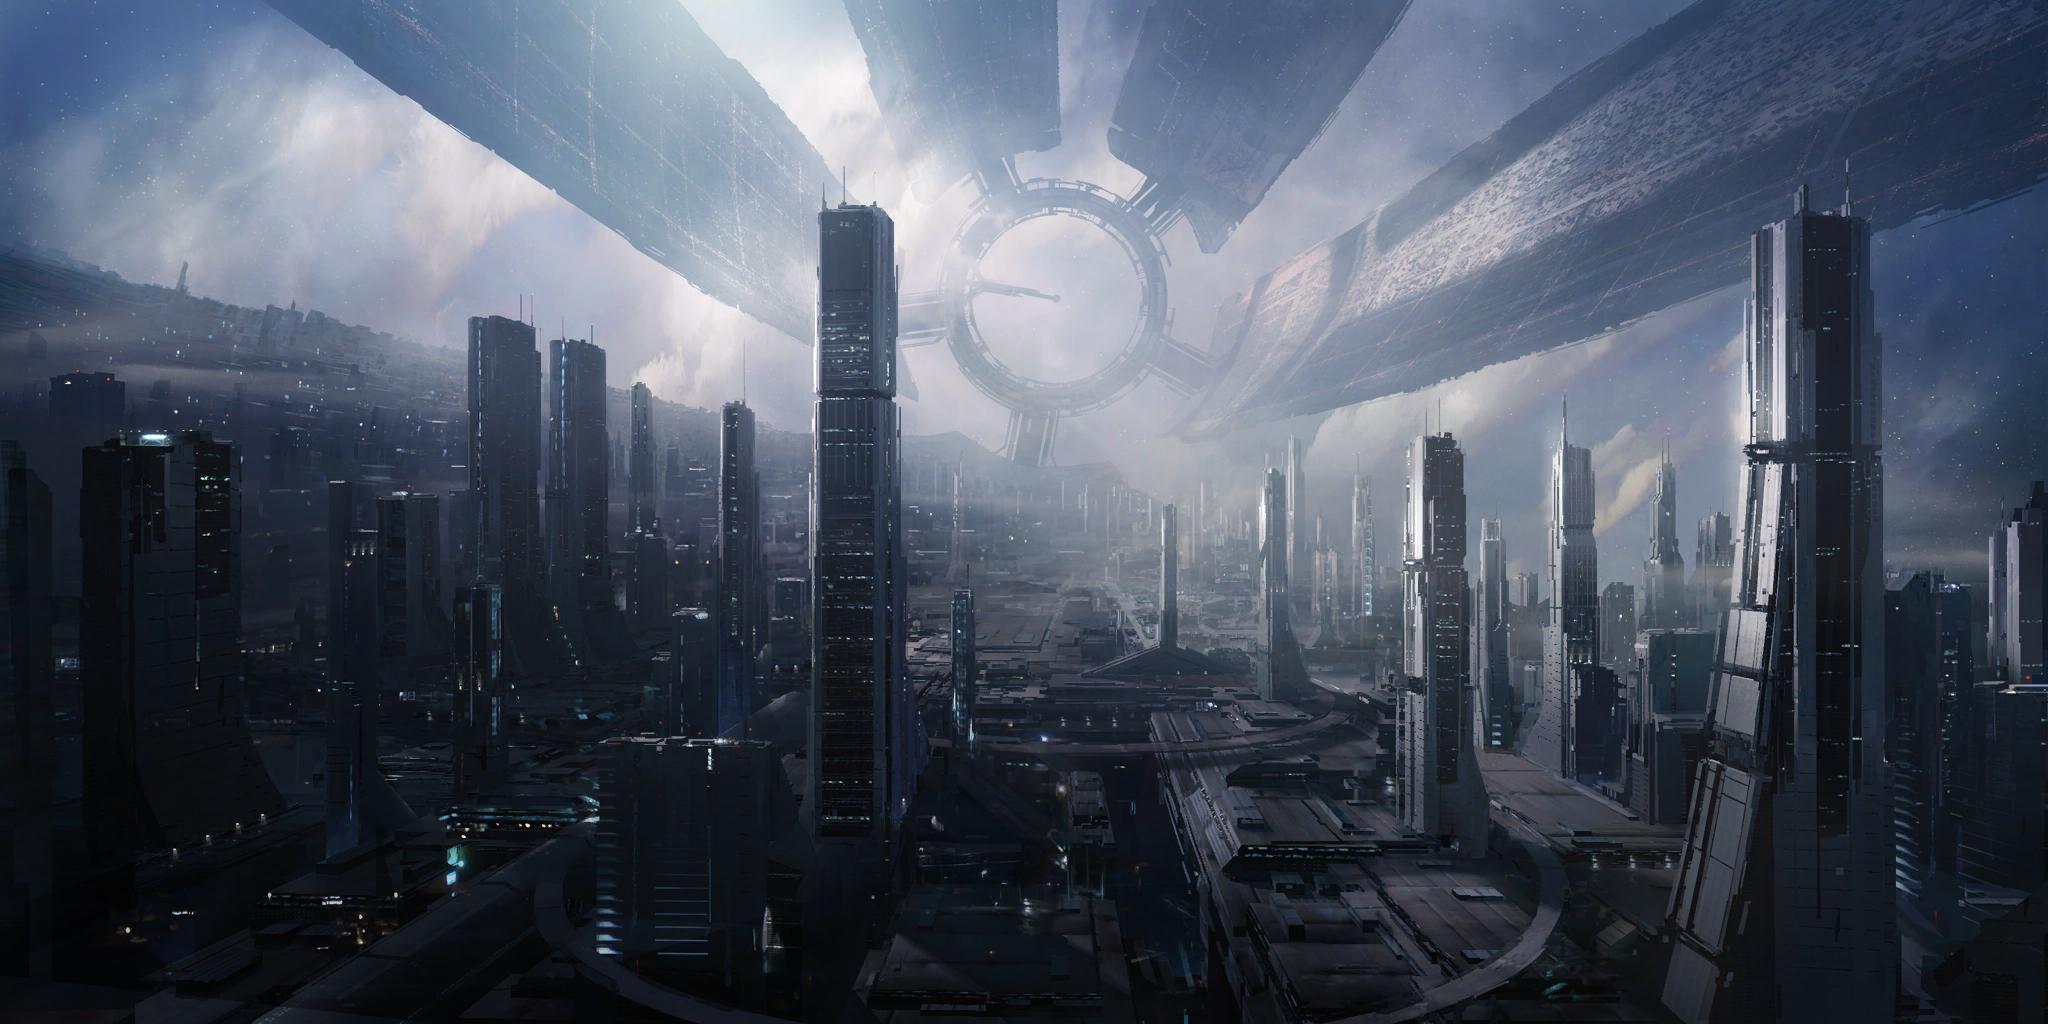 General 2048x1024 Mass Effect Citadel futuristic city cityscape video games Citadel (Mass Effect) science fiction